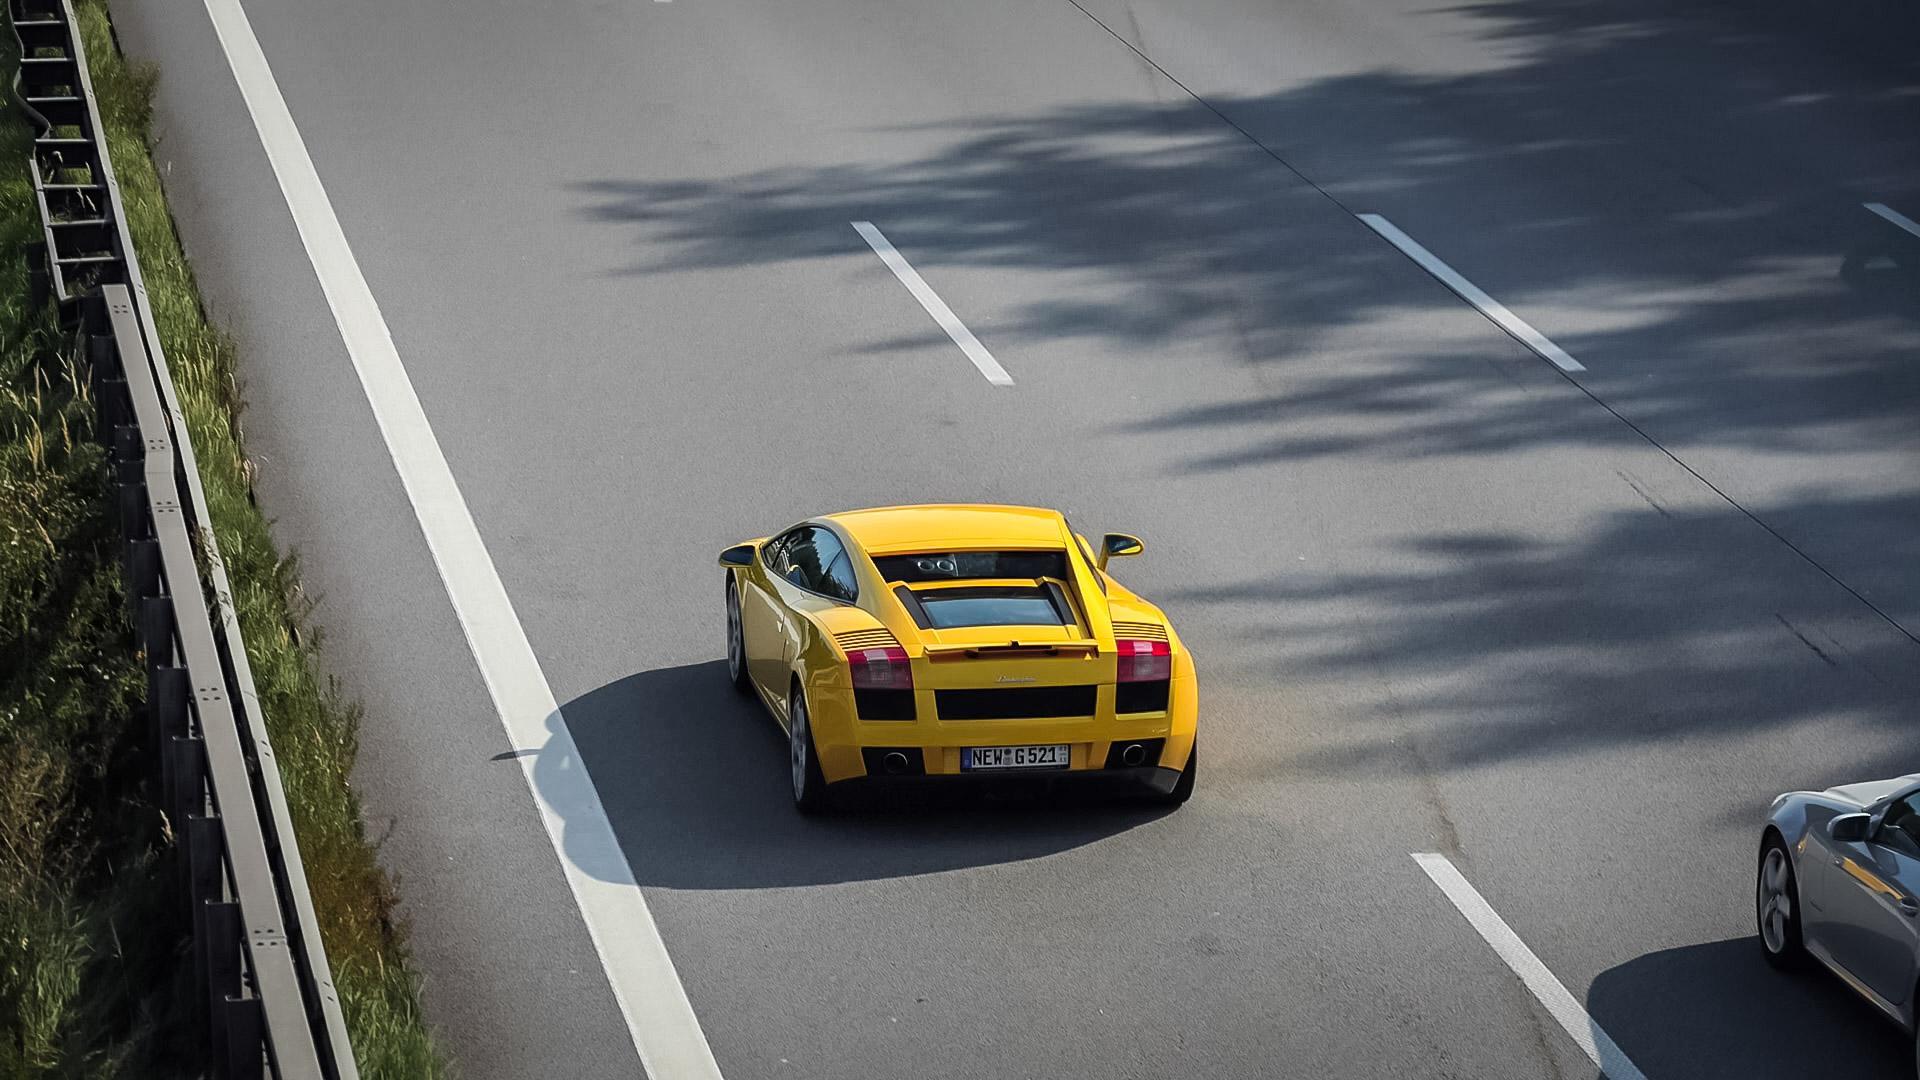 Lamborghini Gallardo - NEW-G-521